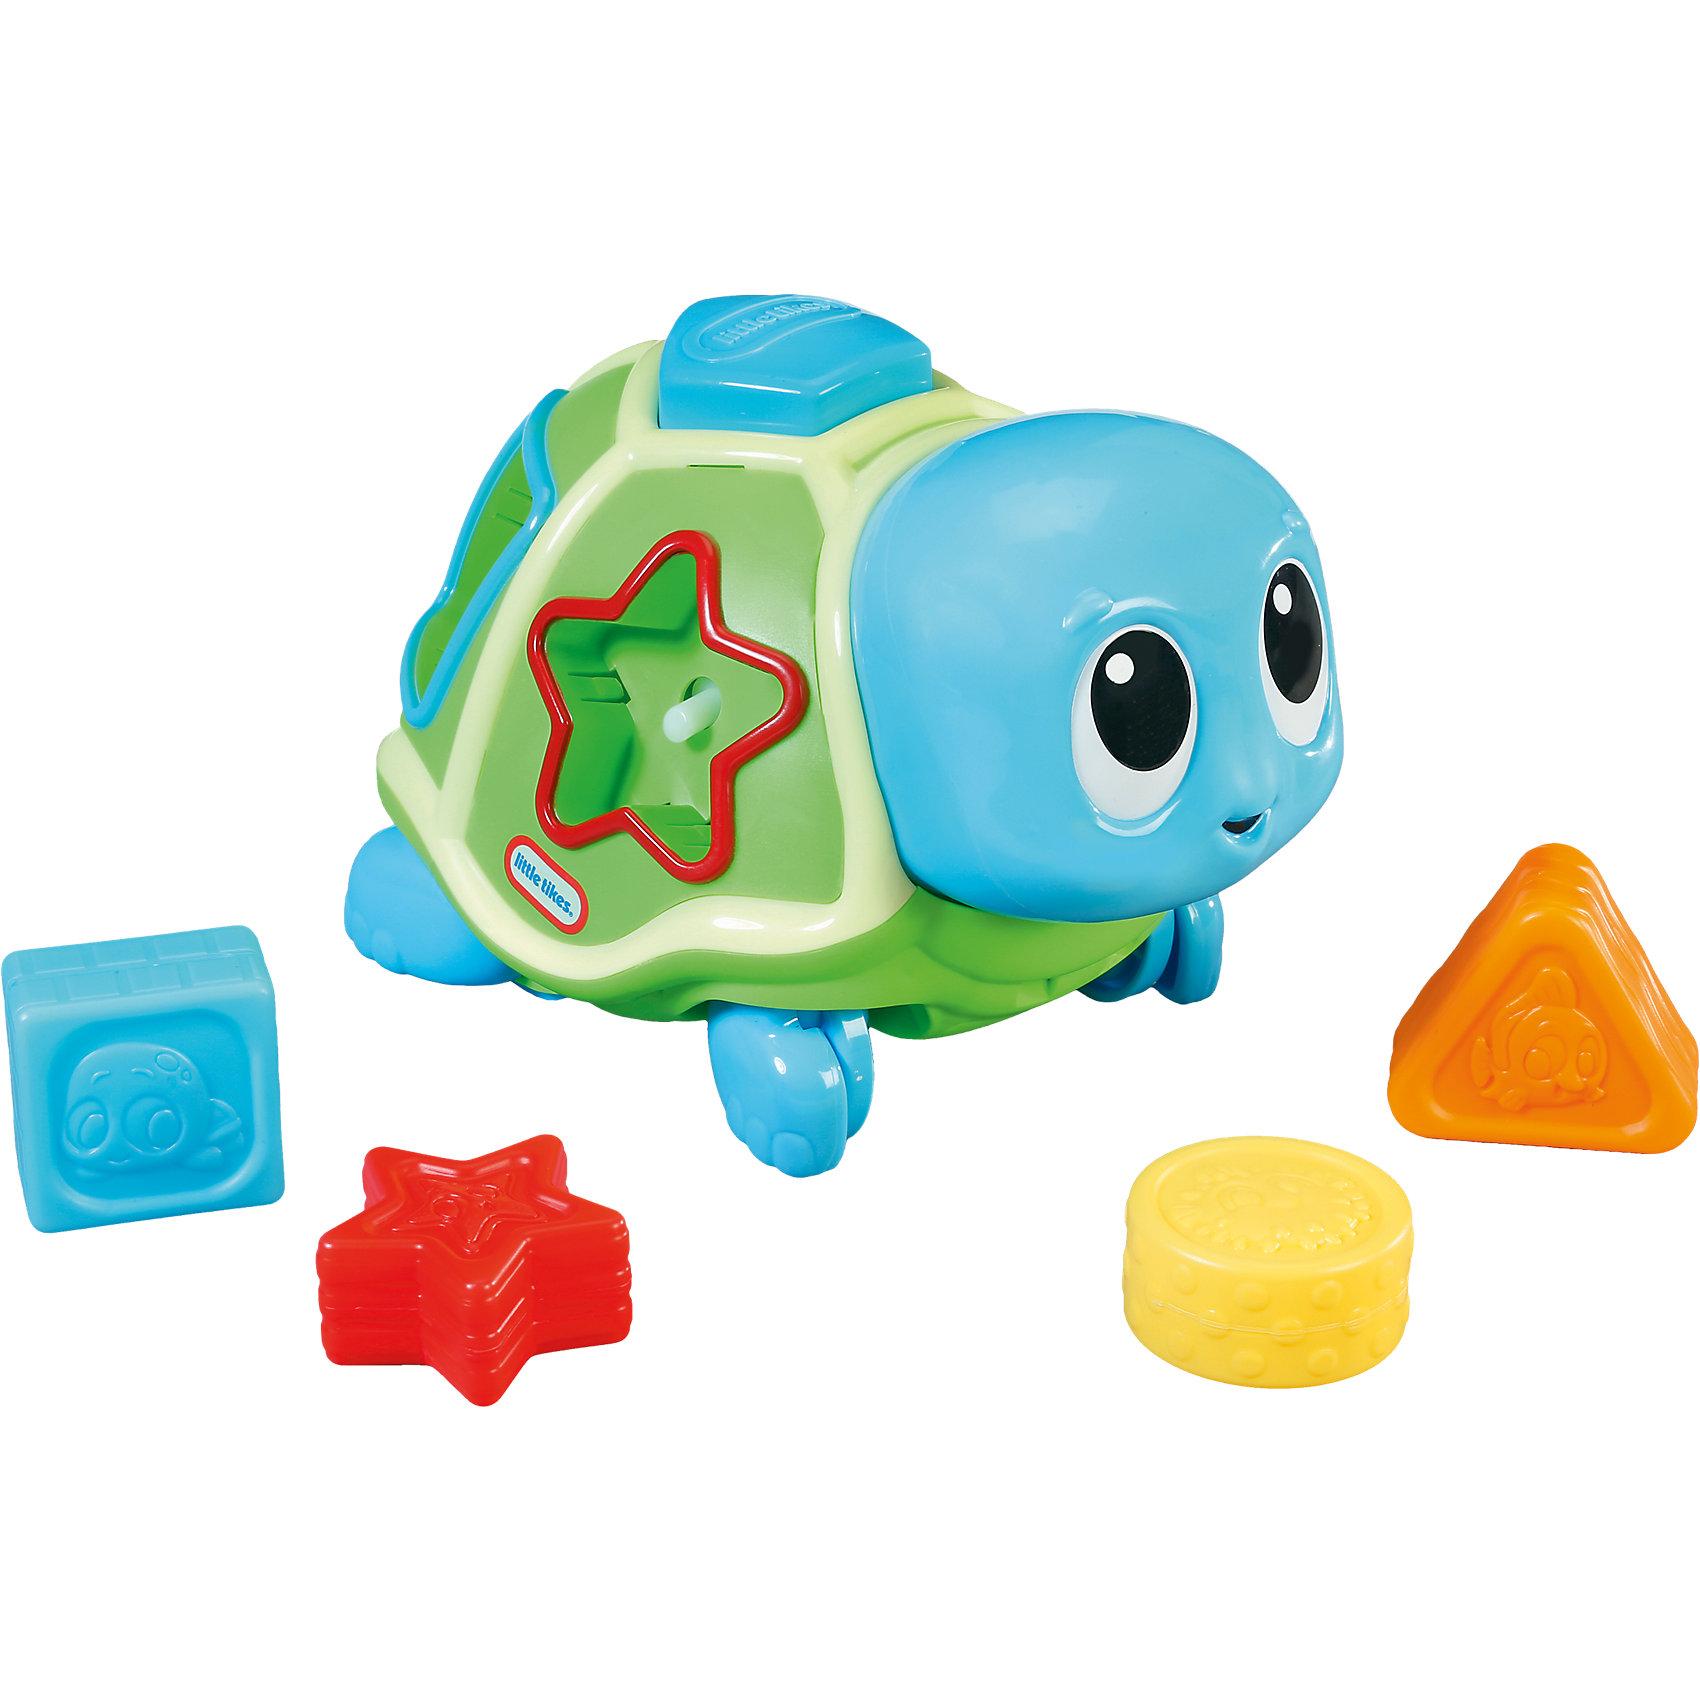 Little Tikes Развивающая игрушка Ползающая черепаха-сортер, со звуком, Little Tikes игрушка развивающая little tikes морская звезда page 8